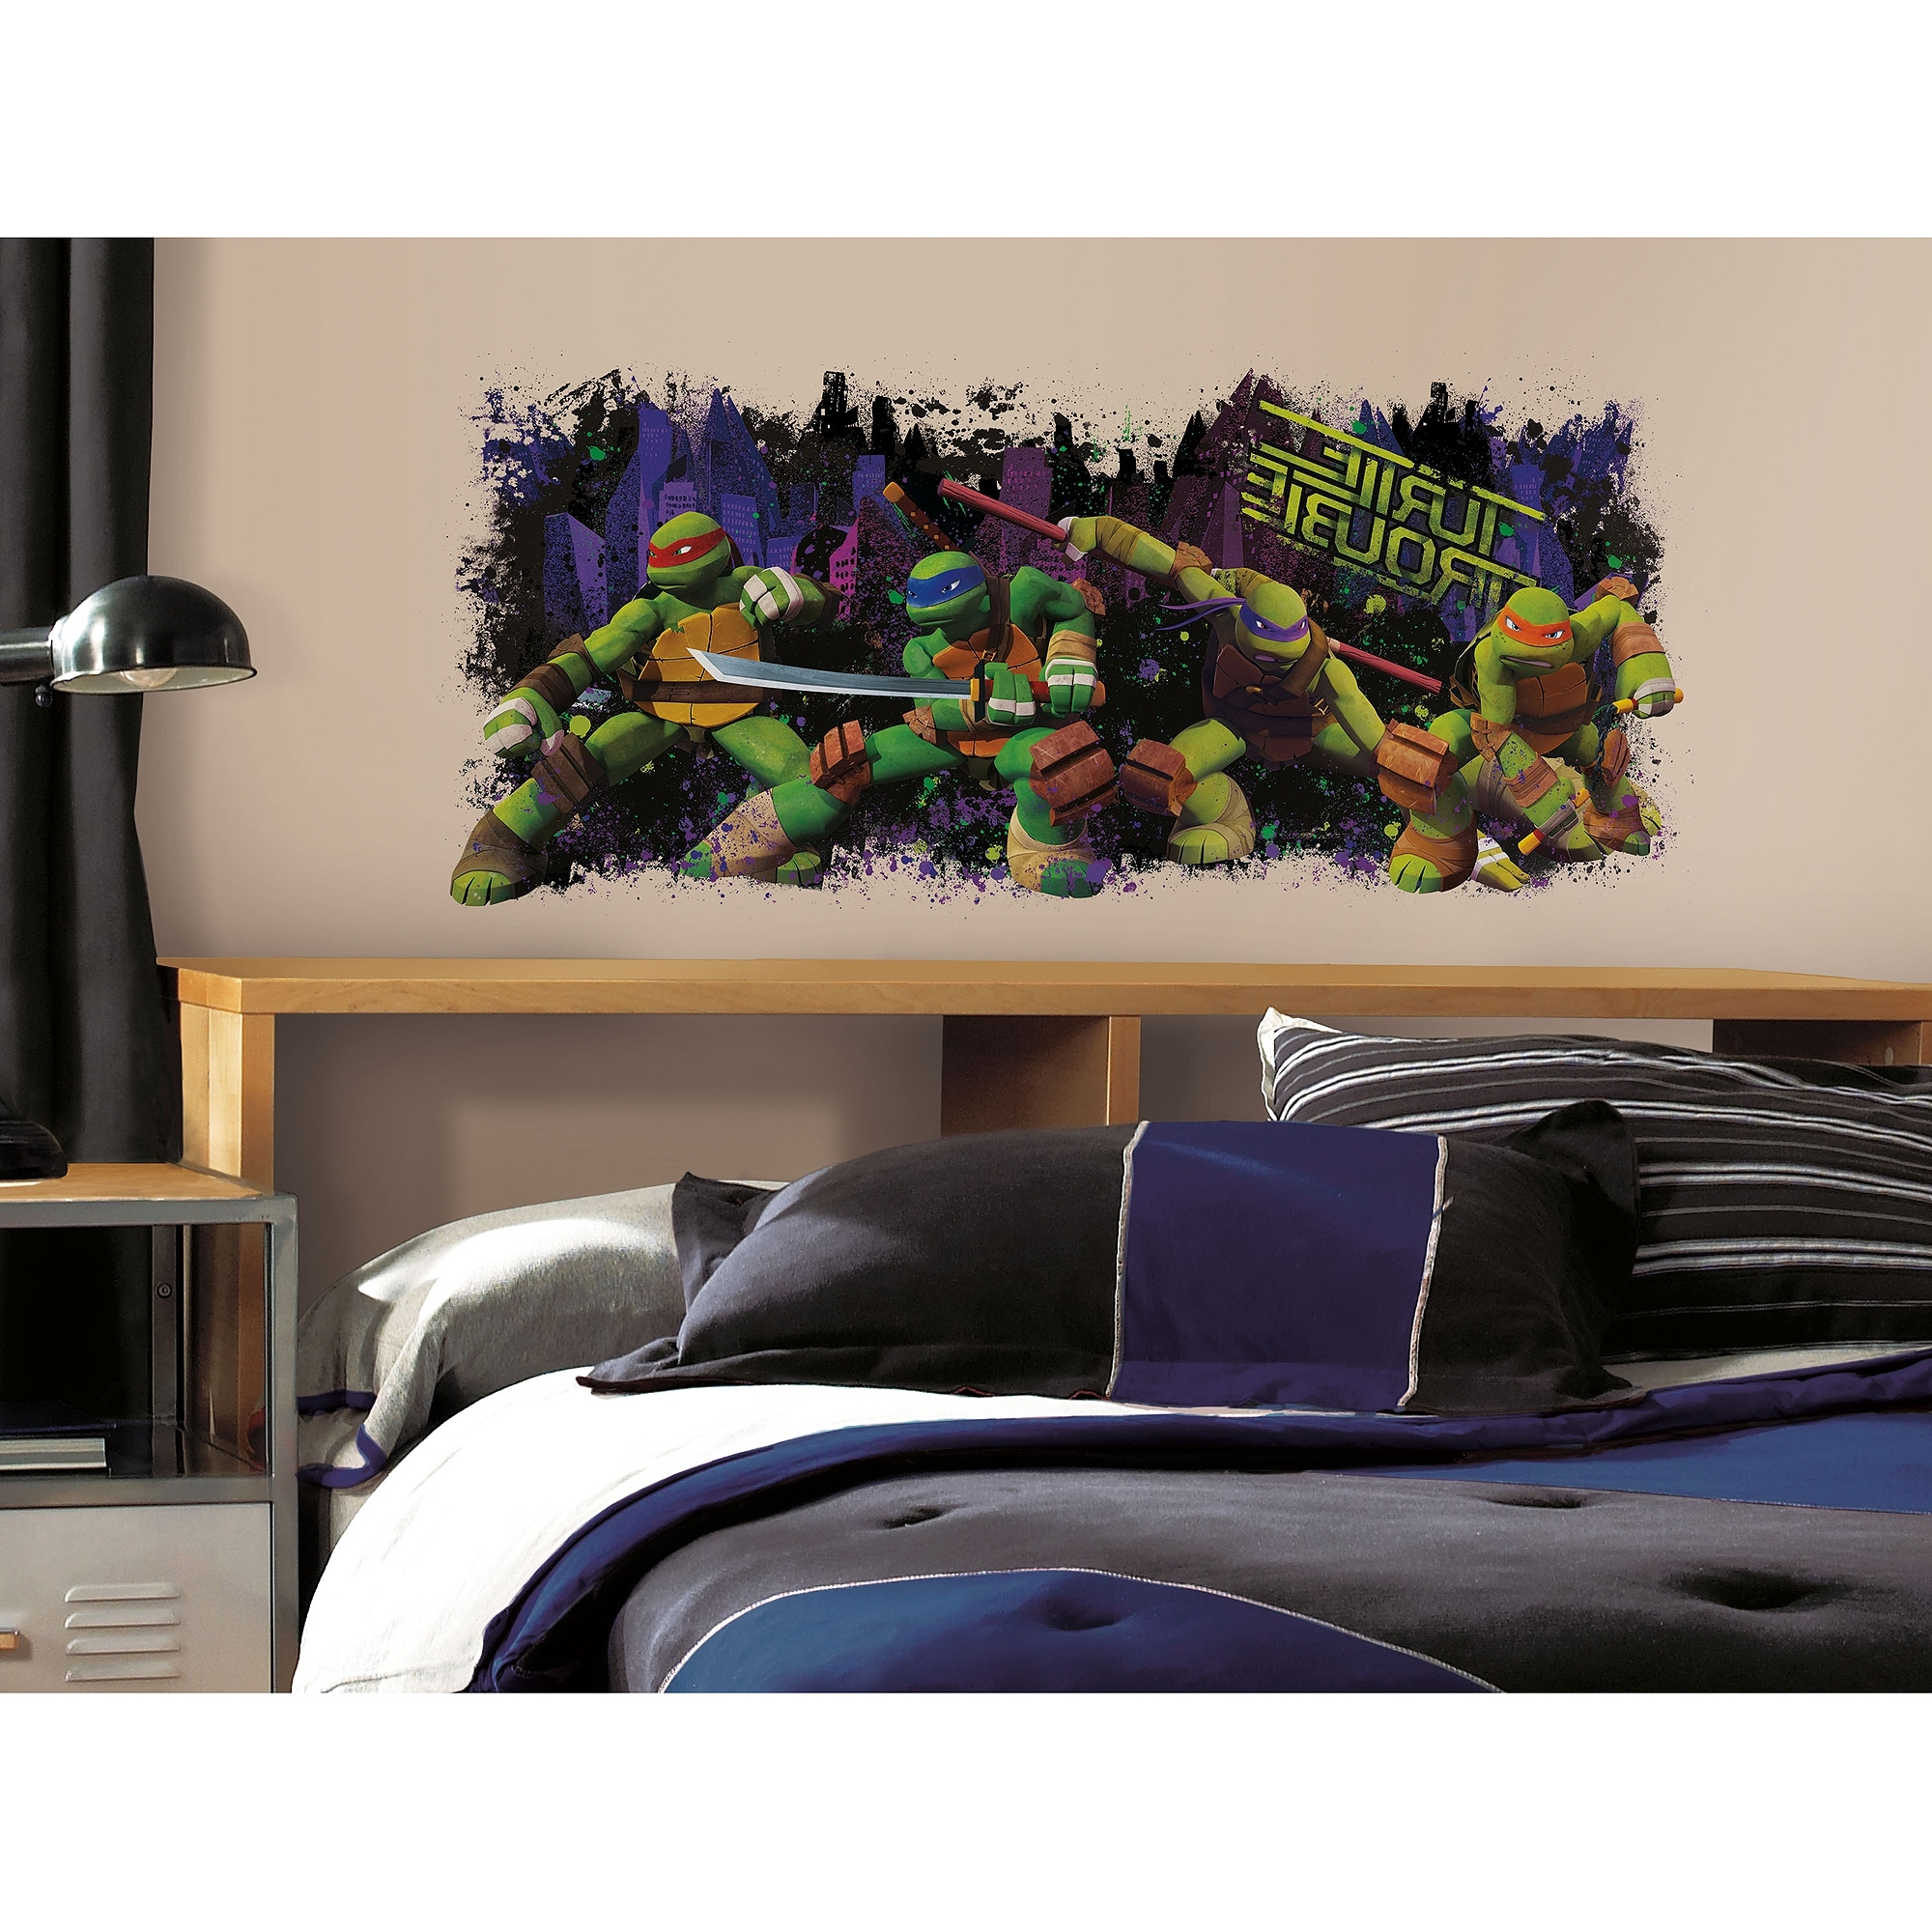 Roommates Teenage Mutant Ninja Turtles Trouble Graphic Peel And In Famous Ninja Turtle Wall Art (View 12 of 15)